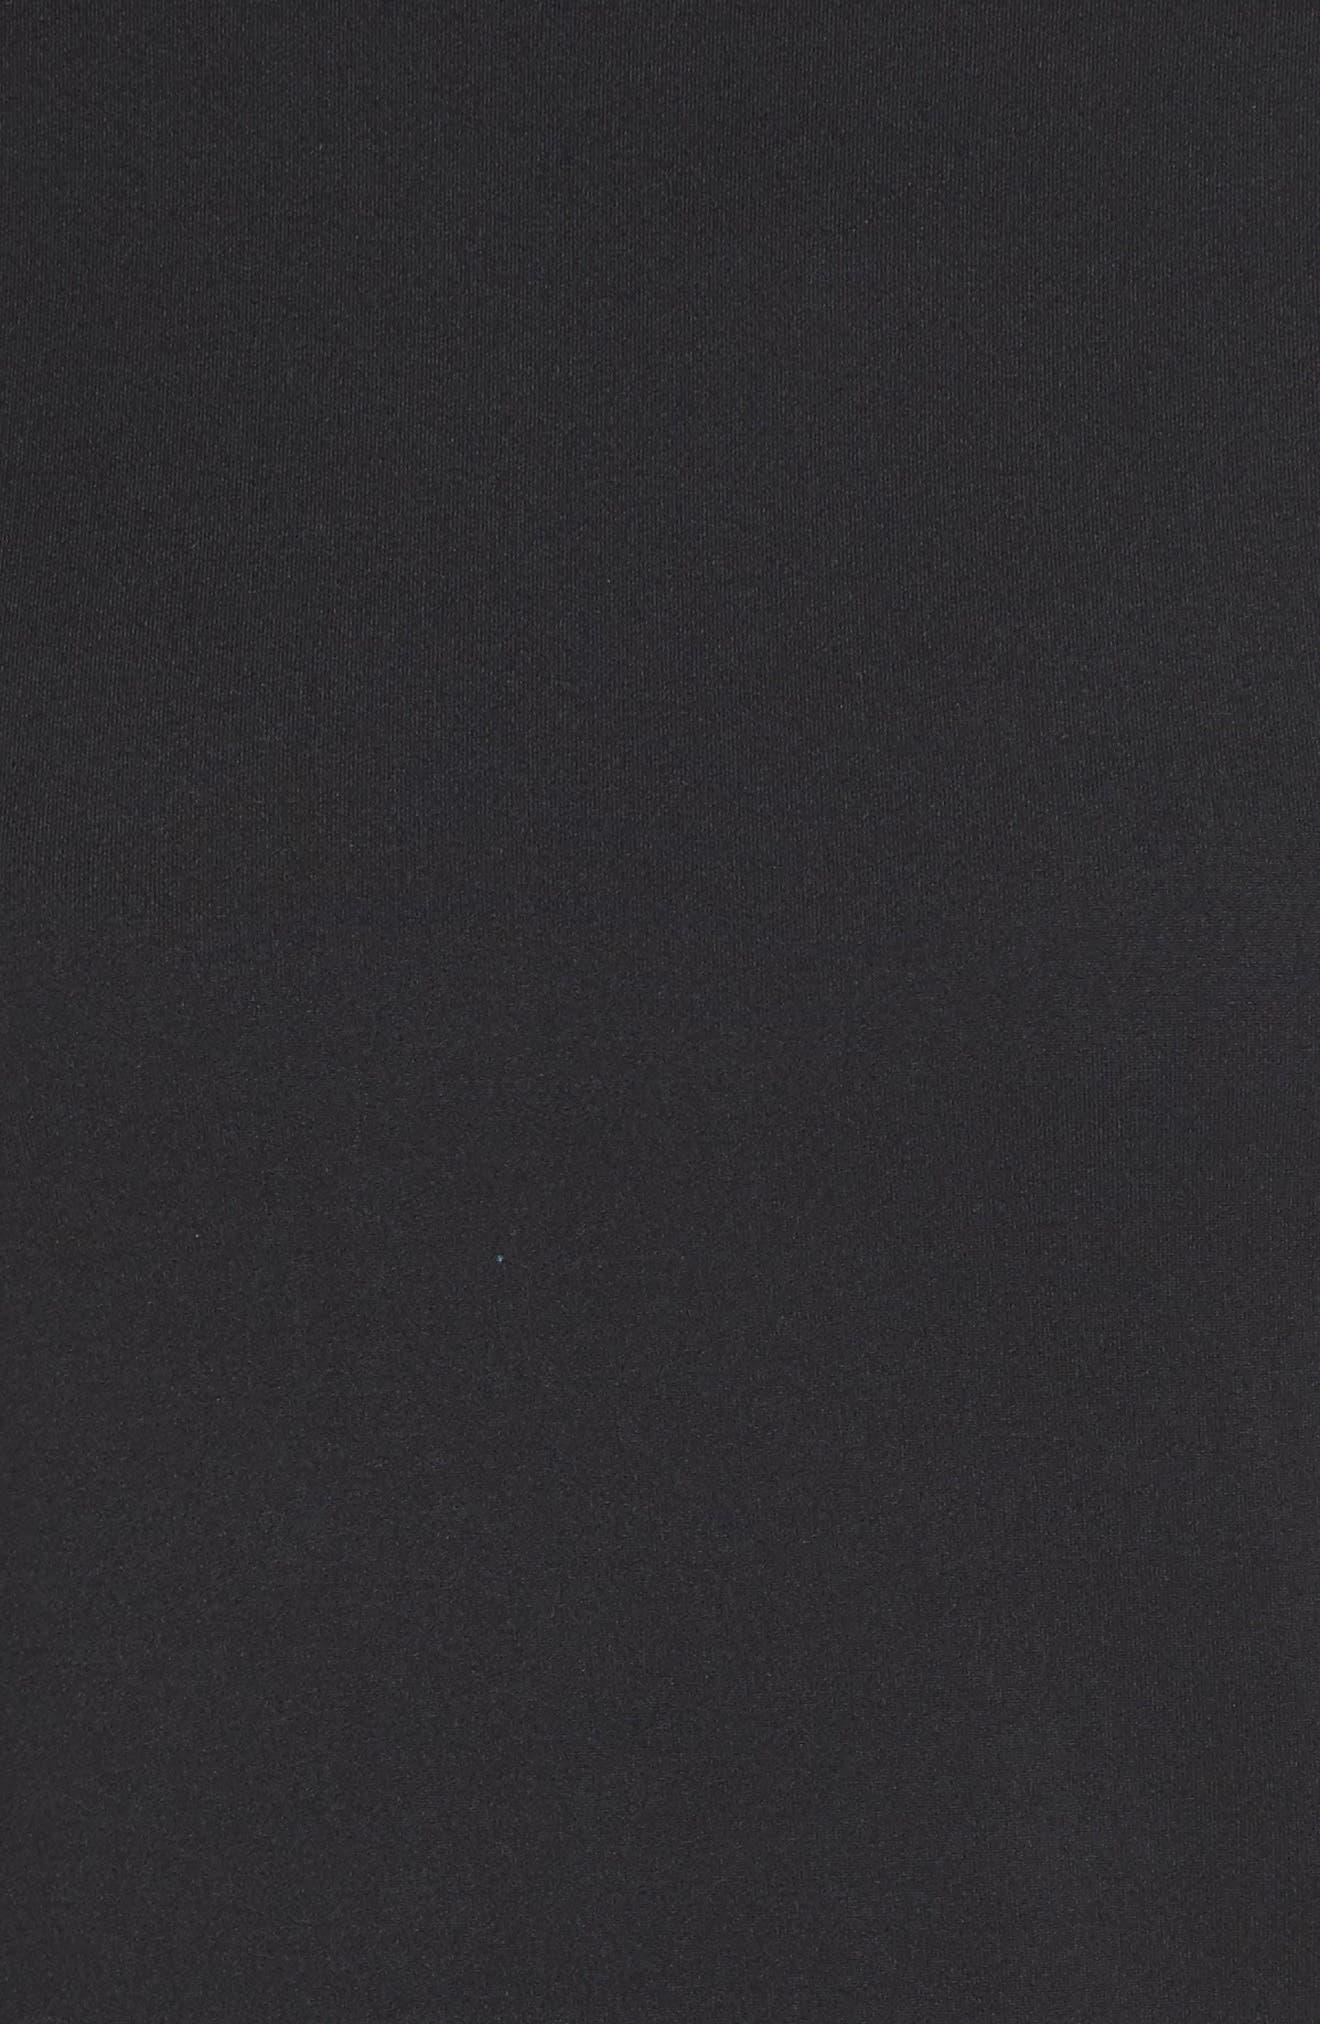 In Transit Long Sleeve Tee,                             Alternate thumbnail 6, color,                             Black